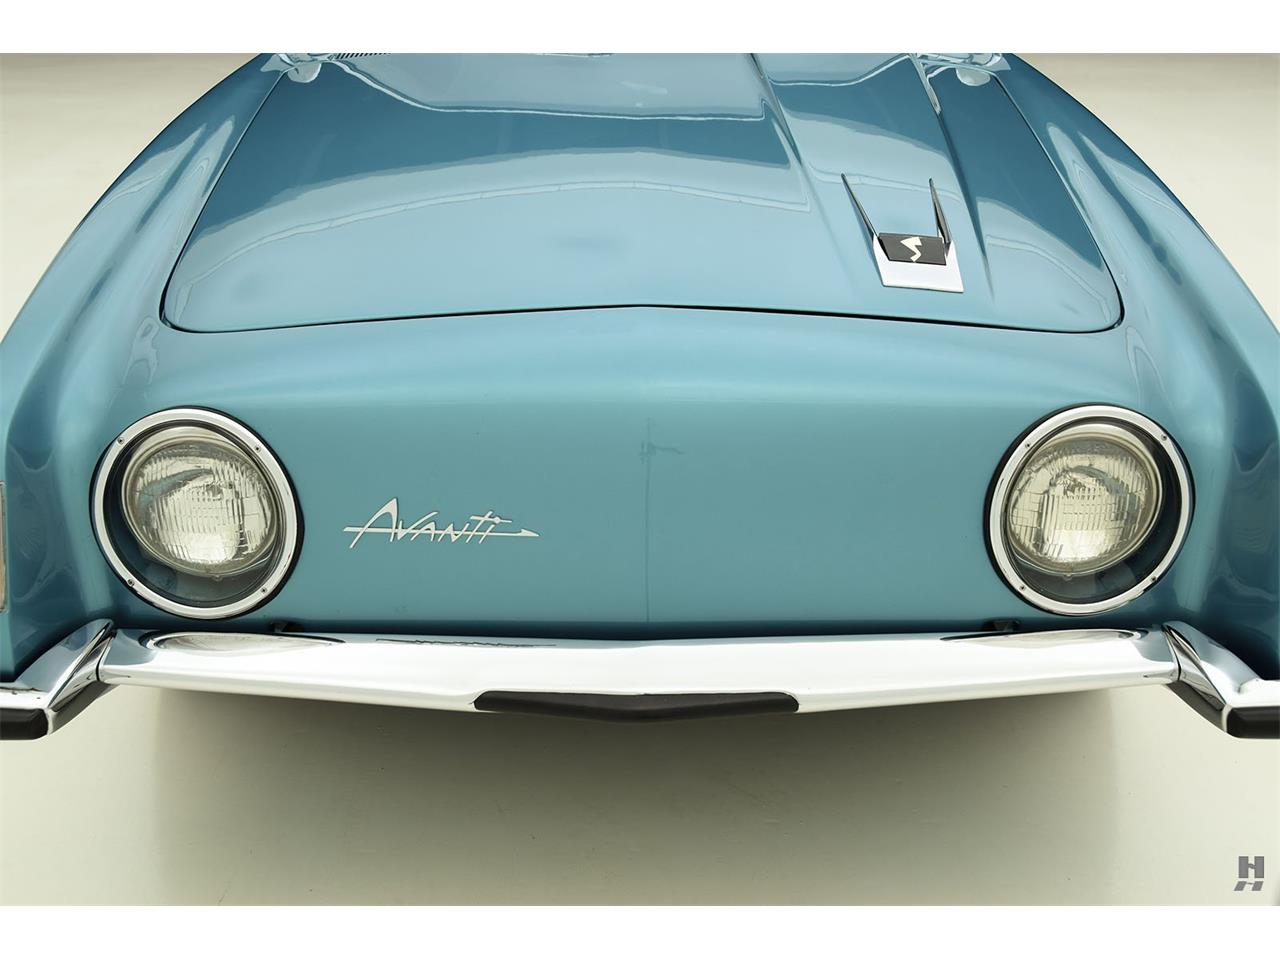 Large Picture of Classic '63 Avanti located in Saint Louis Missouri - $77,500.00 - MGHN